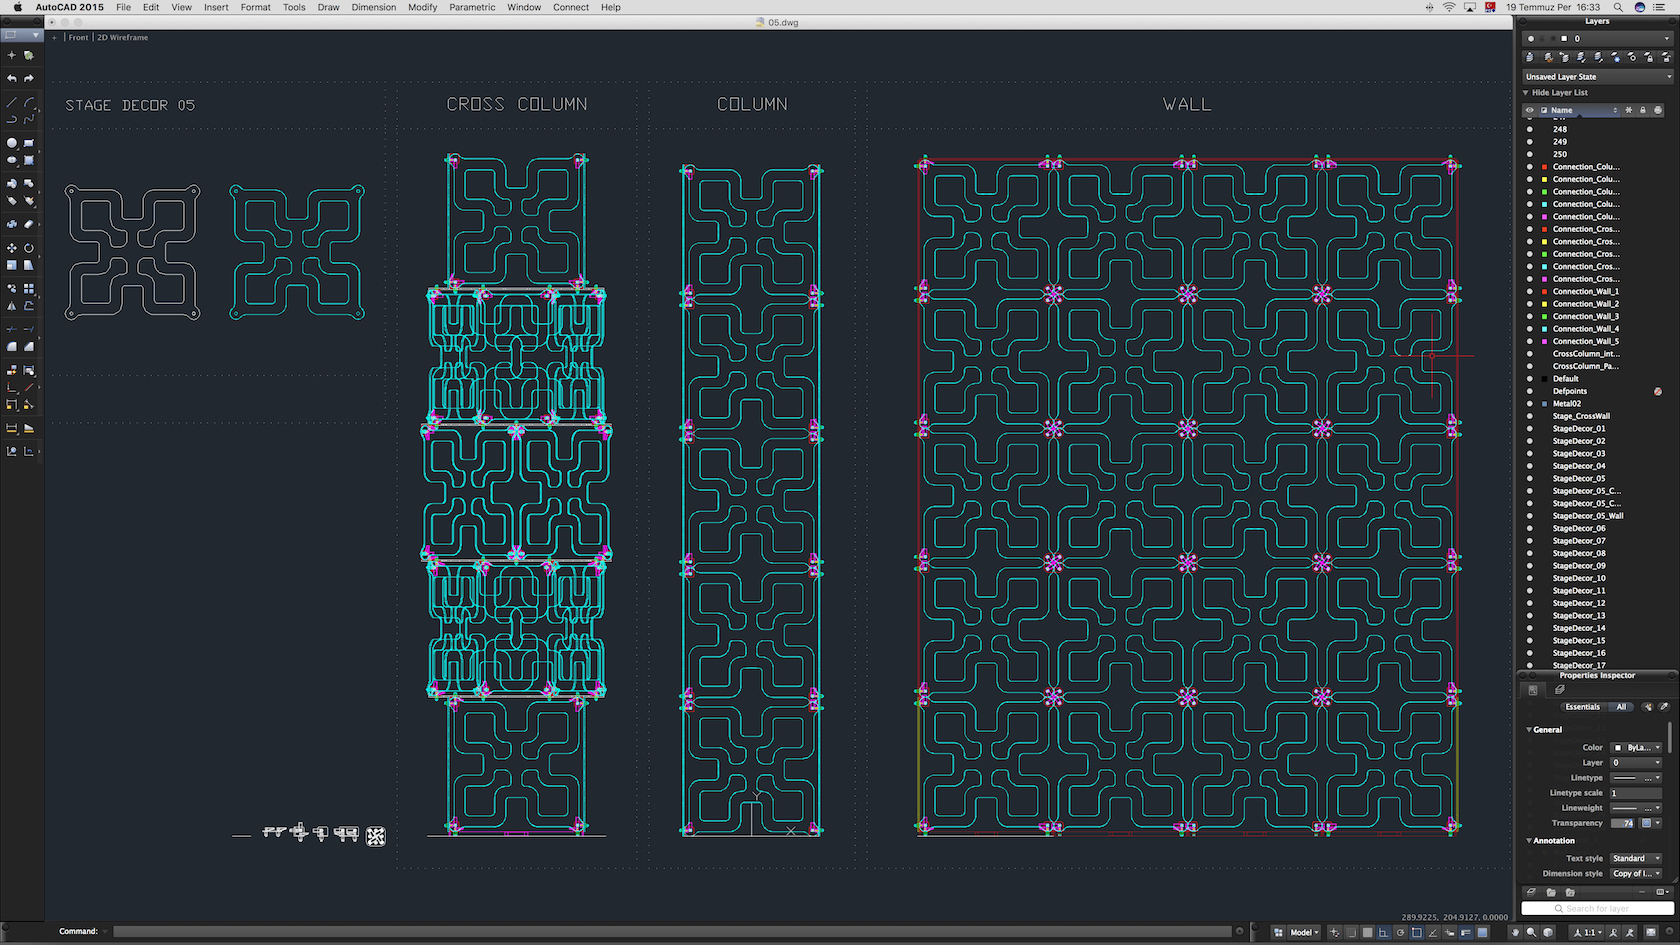 70-Cad-05-01-1680.jpg Download STL file Stage Decor Collection 01 (Modular 9 Pieces) • 3D printer model, akerStudio